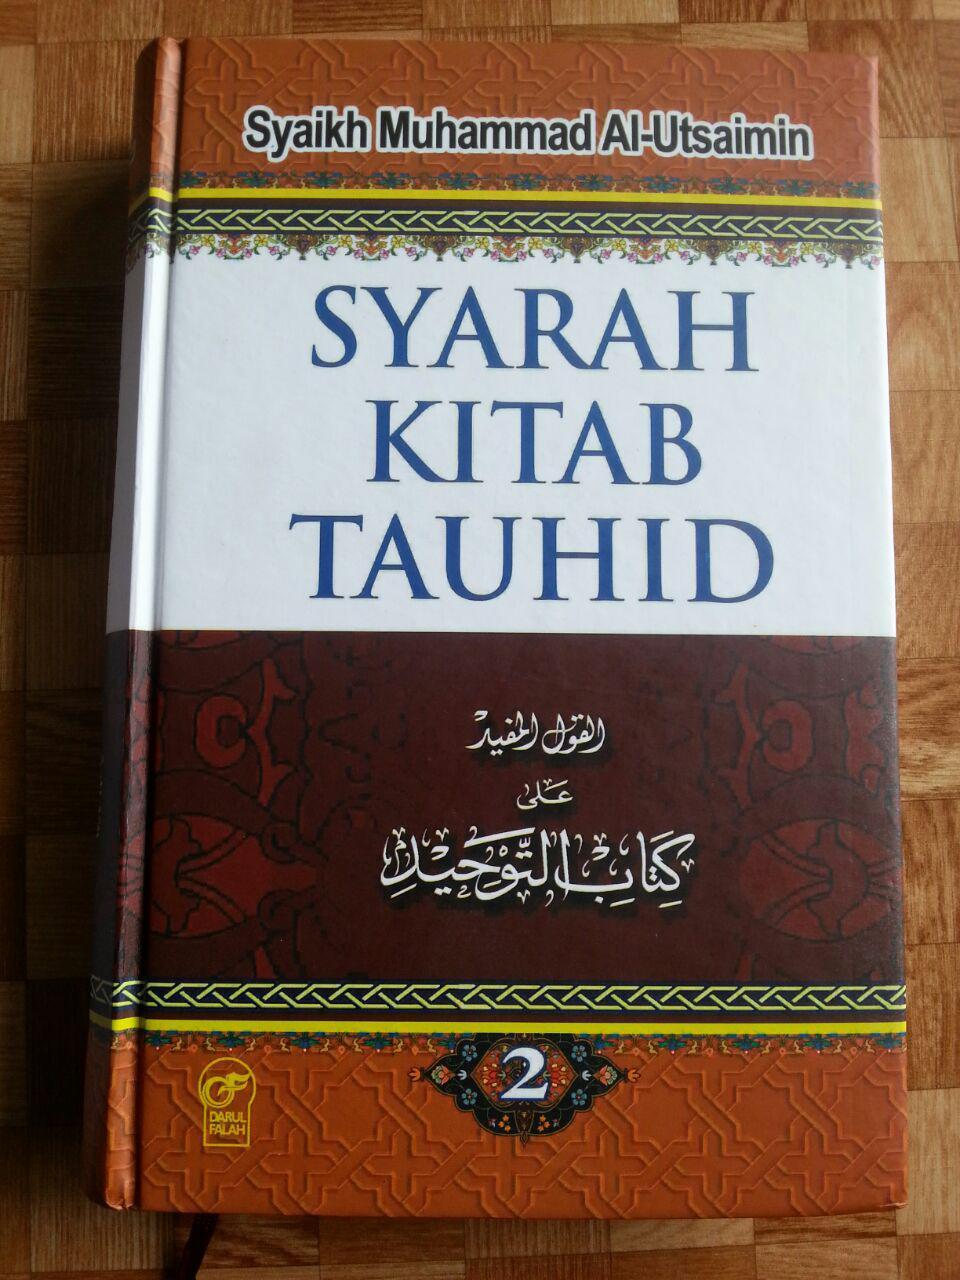 Buku Syarah Kitab Tauhid 1 Set 2 Jilid cover 2